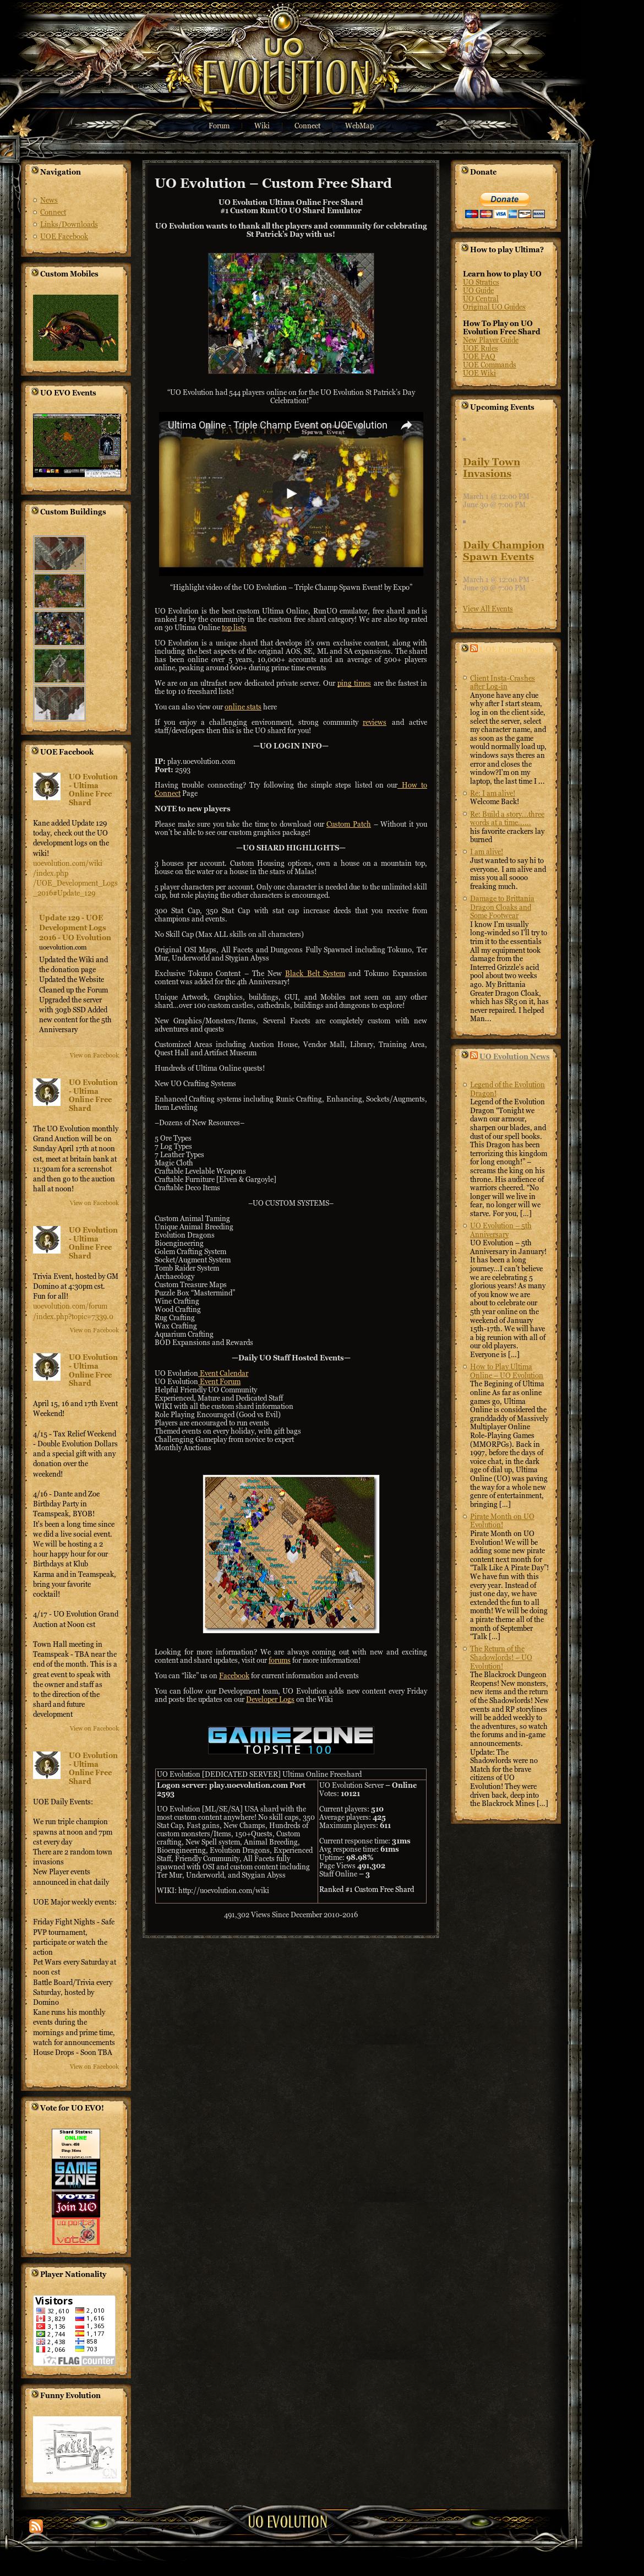 Uo Evolution - Ultima Online Free Shard Competitors, Revenue